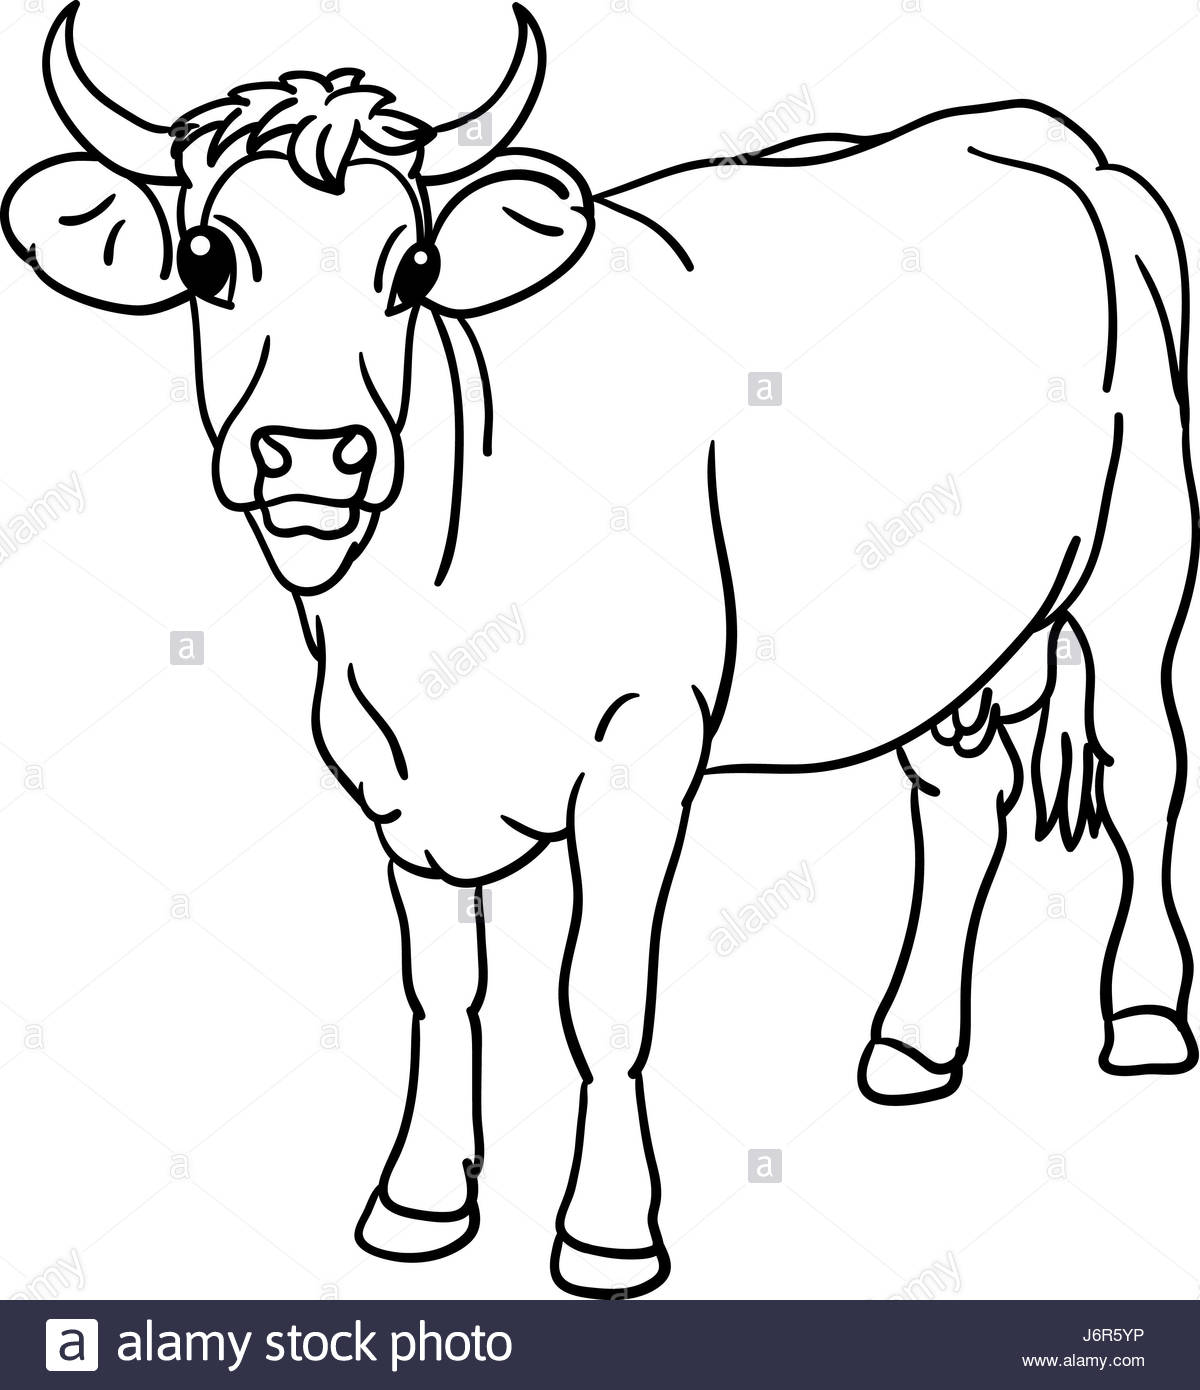 1200x1390 Isolated Animal Illustration Cow Draw Art Isolated Animal Mammal